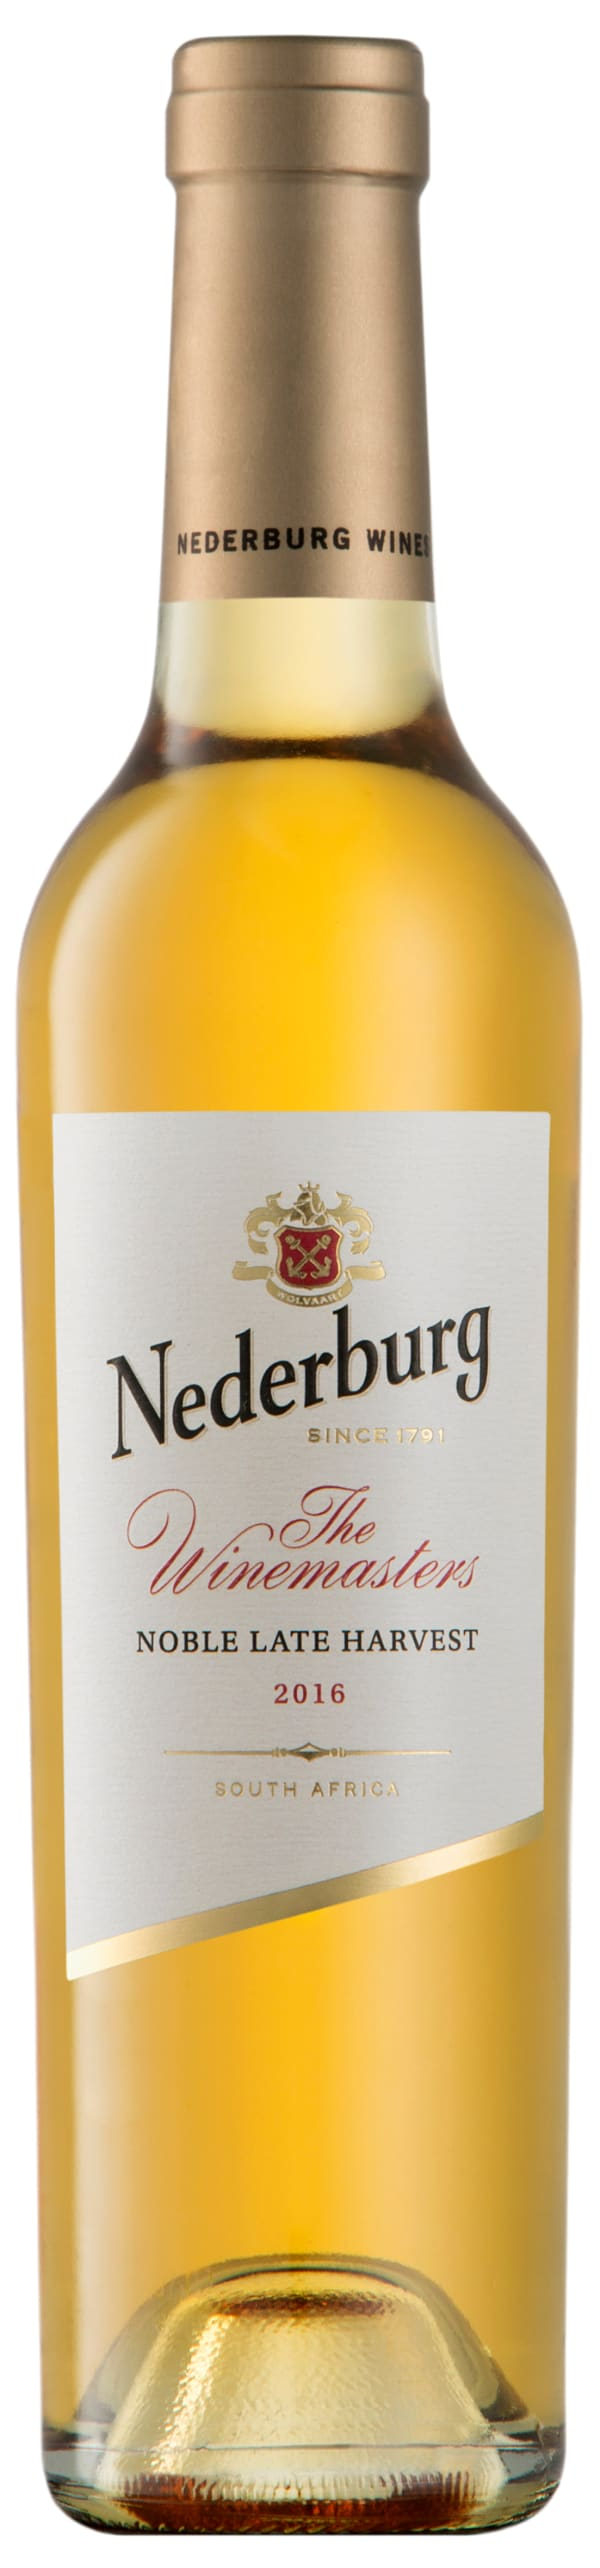 Nederburg The Winemasters Noble Late Harvest 2016